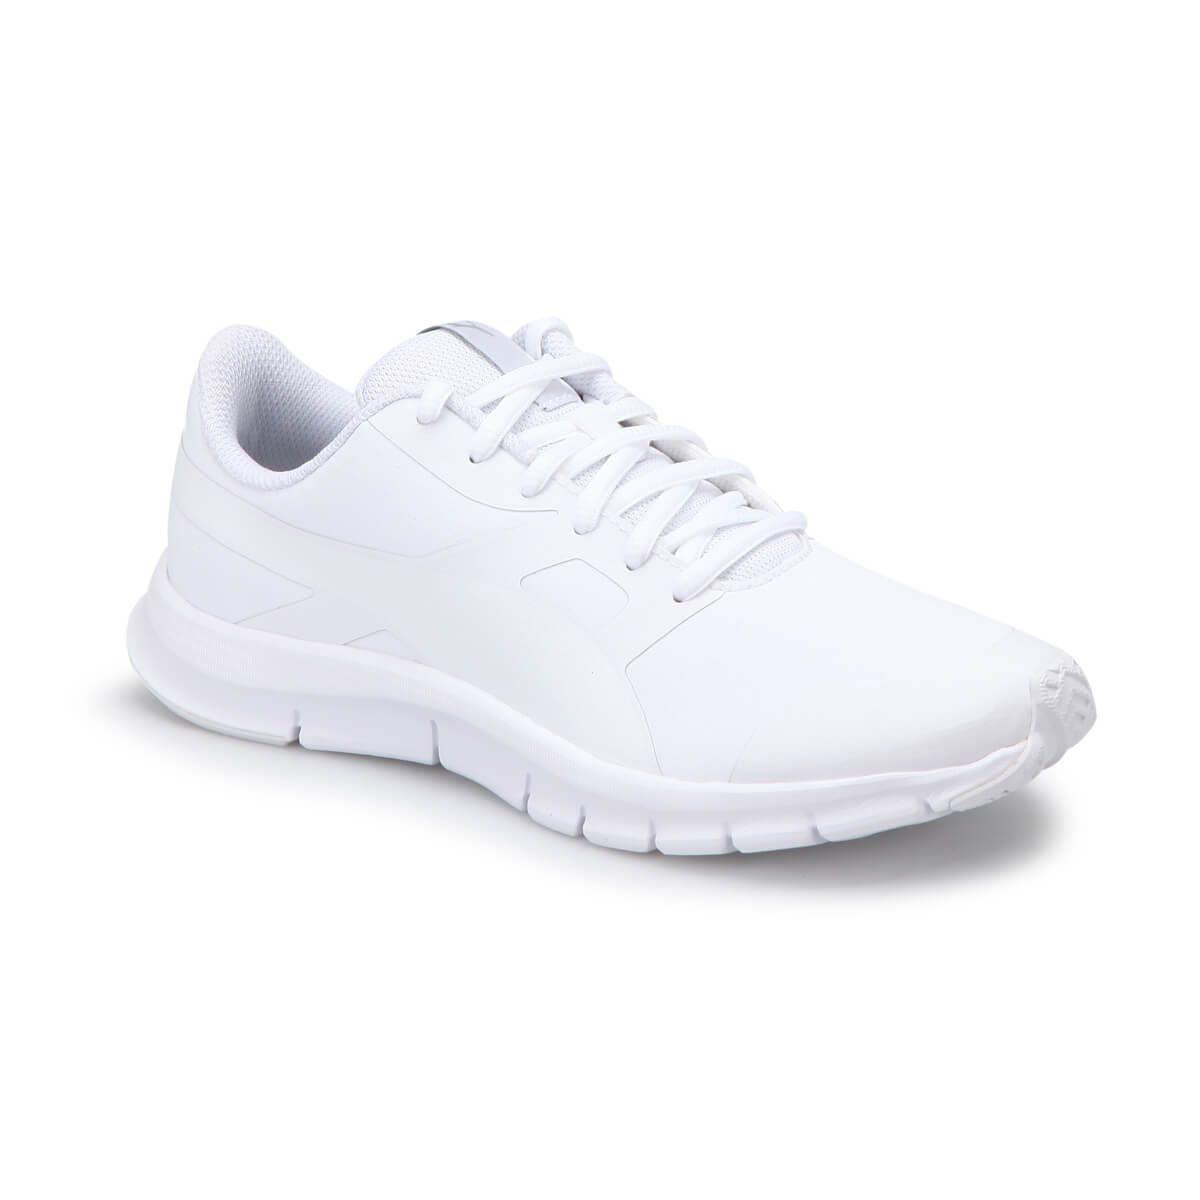 Puma Flexracer Sl Jr White Beyaz Kadin Kosu Ayakkabisi Big 1 Bayan Ayakkabi Sneaker Spor Ayakabilar